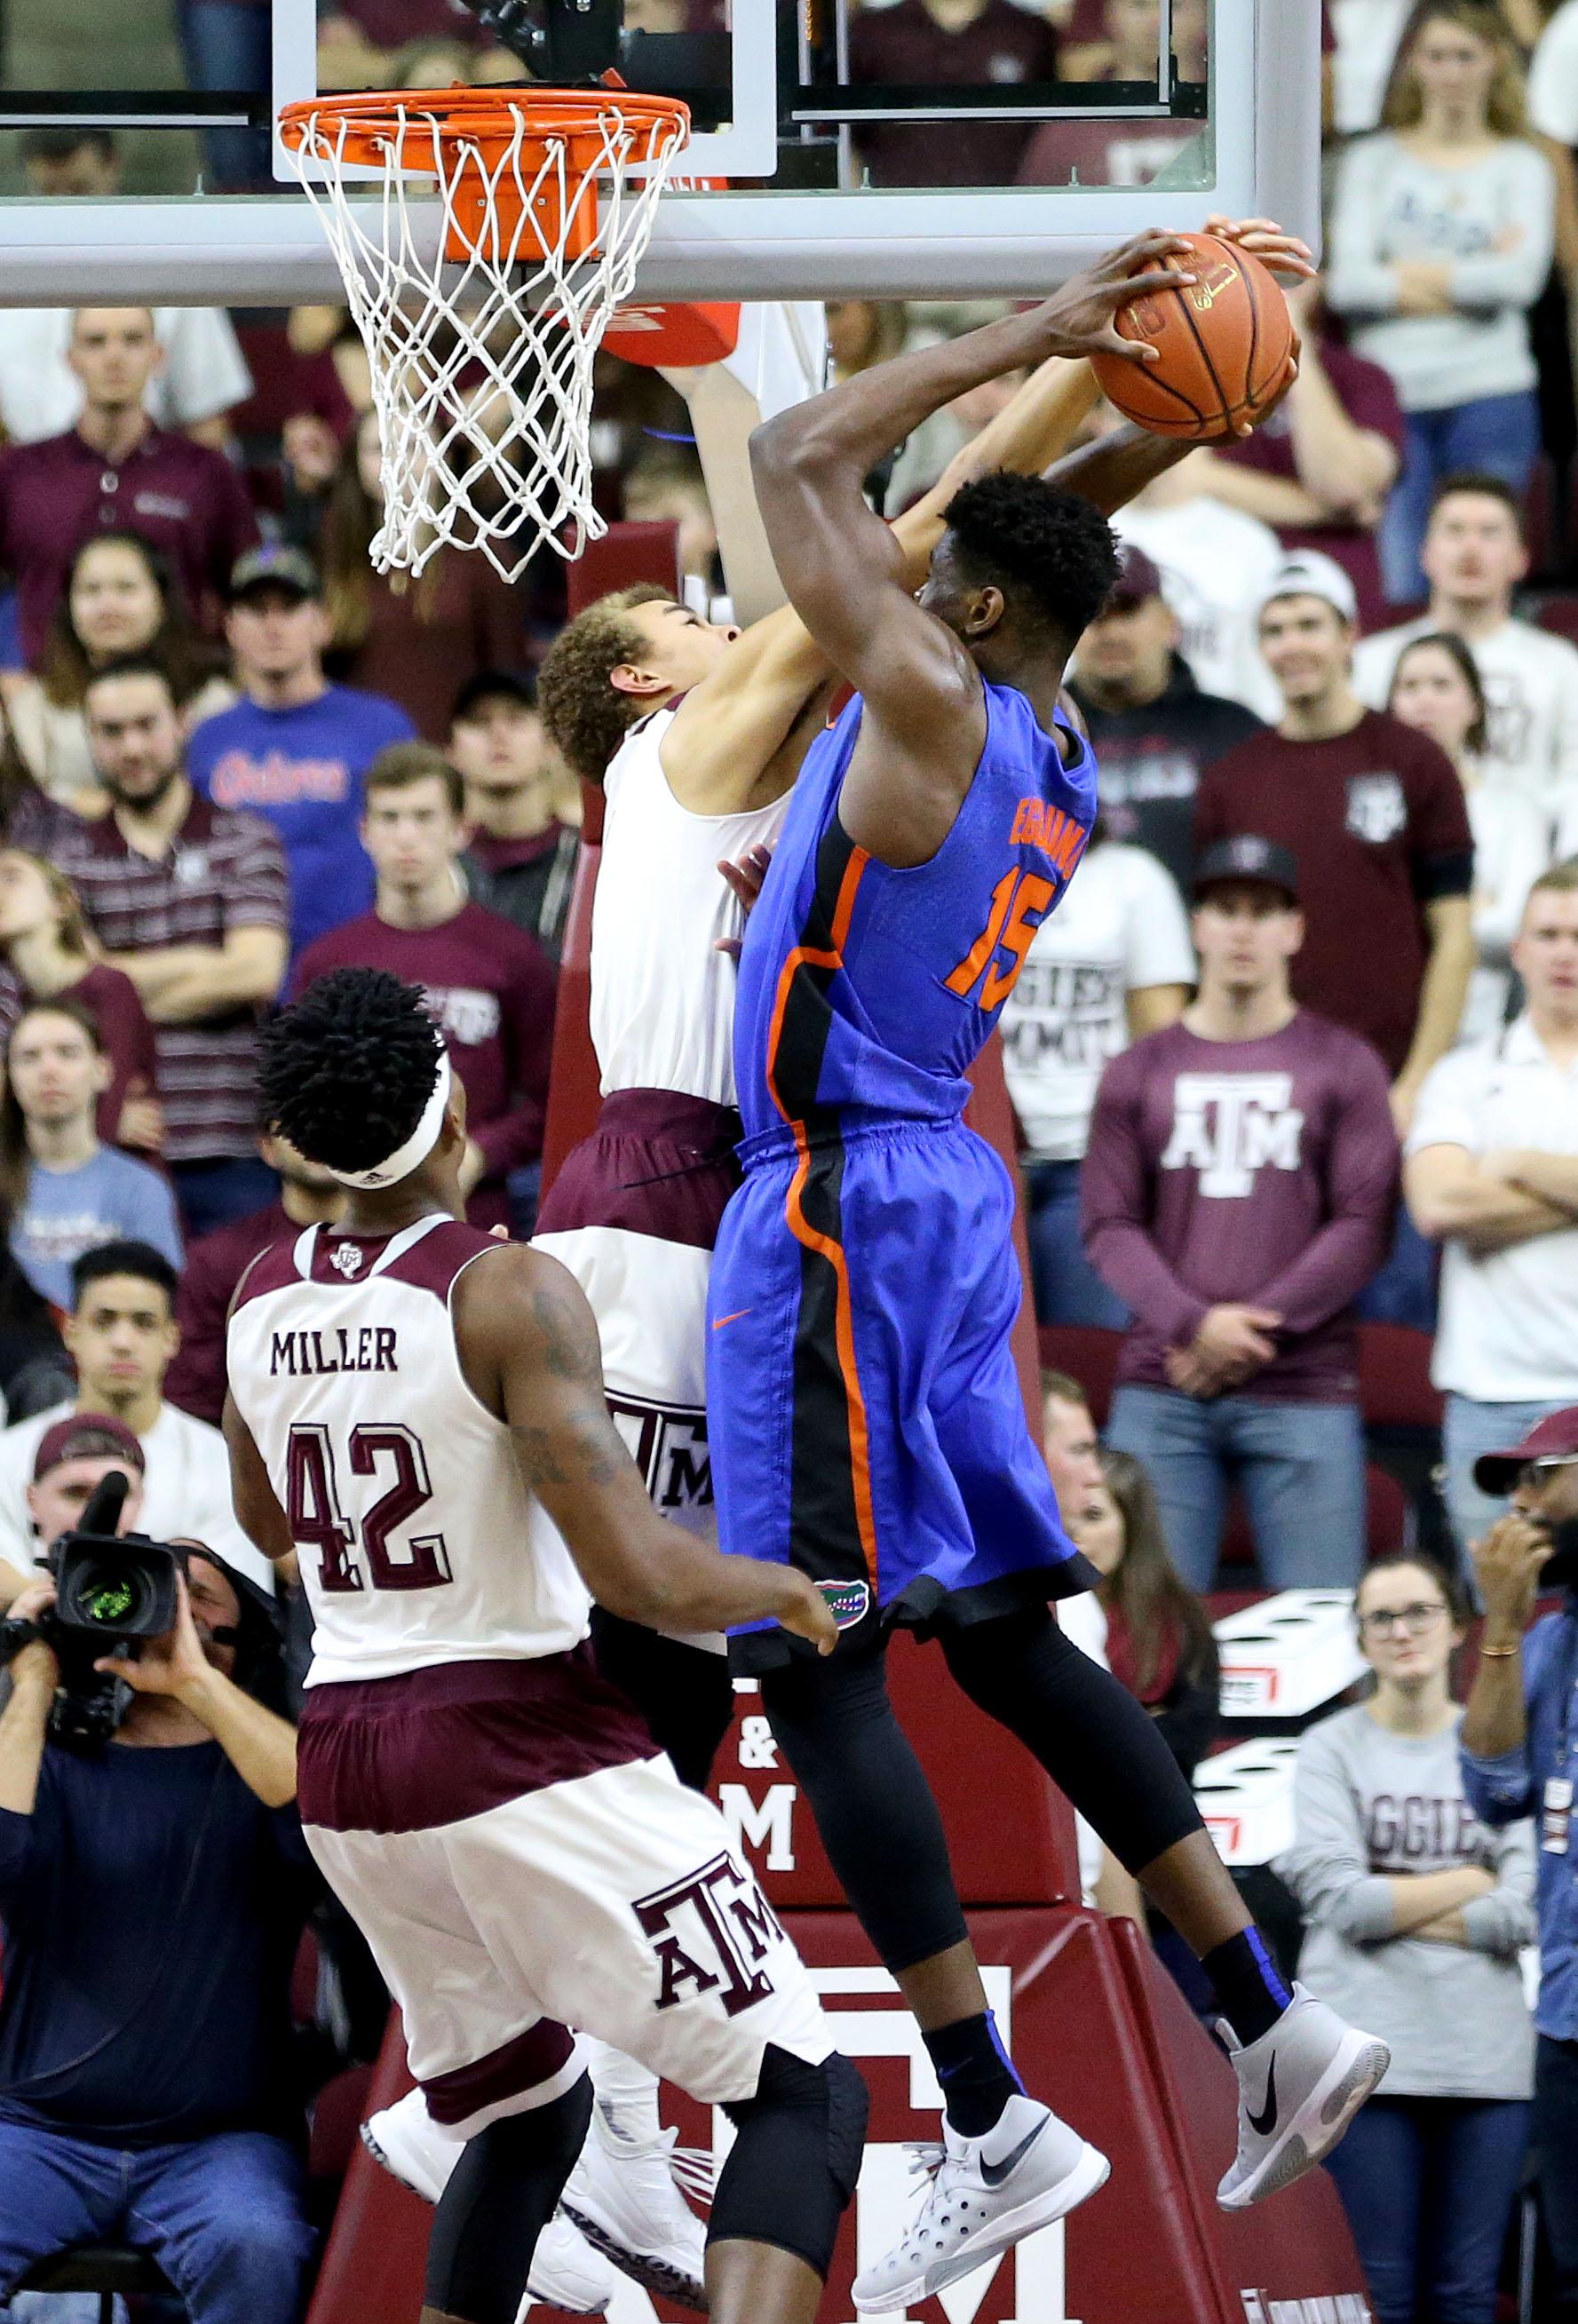 Texas A&M's D.J. Hogg (1) blocks a shot by Florida's John Egbunu (15) during the first half of an NCAA college basketball game, Tuesday, Jan. 12, 2016, in College Station, Texas. (AP Photo/Sam Craft)